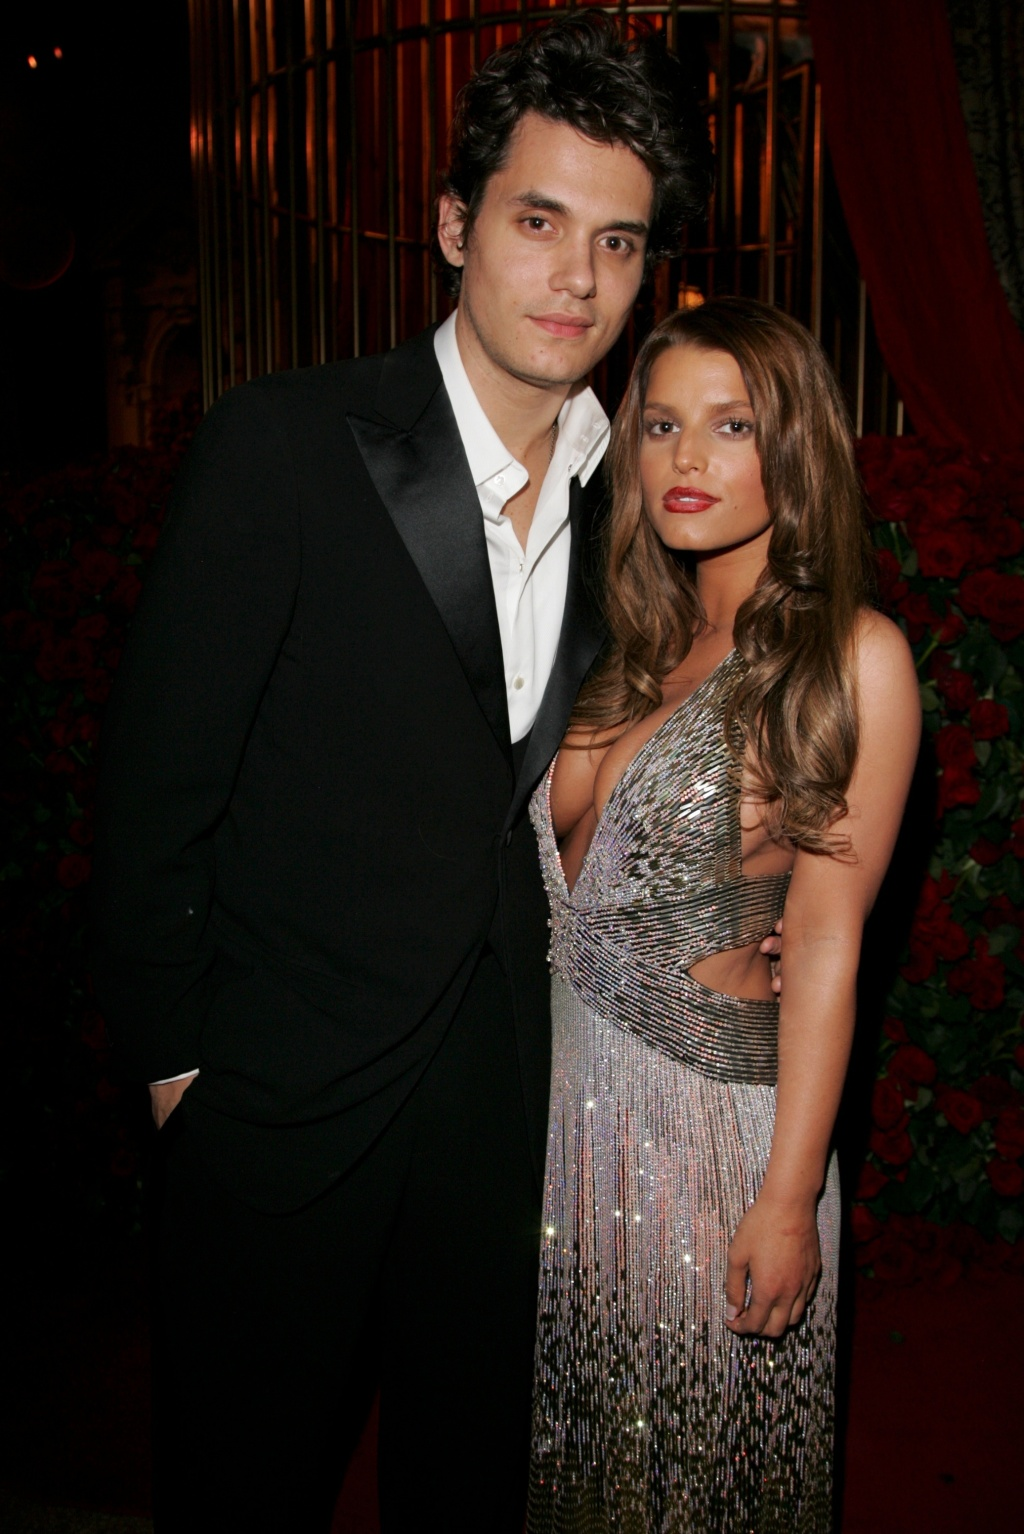 Jessica Simpson, ex boyfriend John Mayer, Met Gala